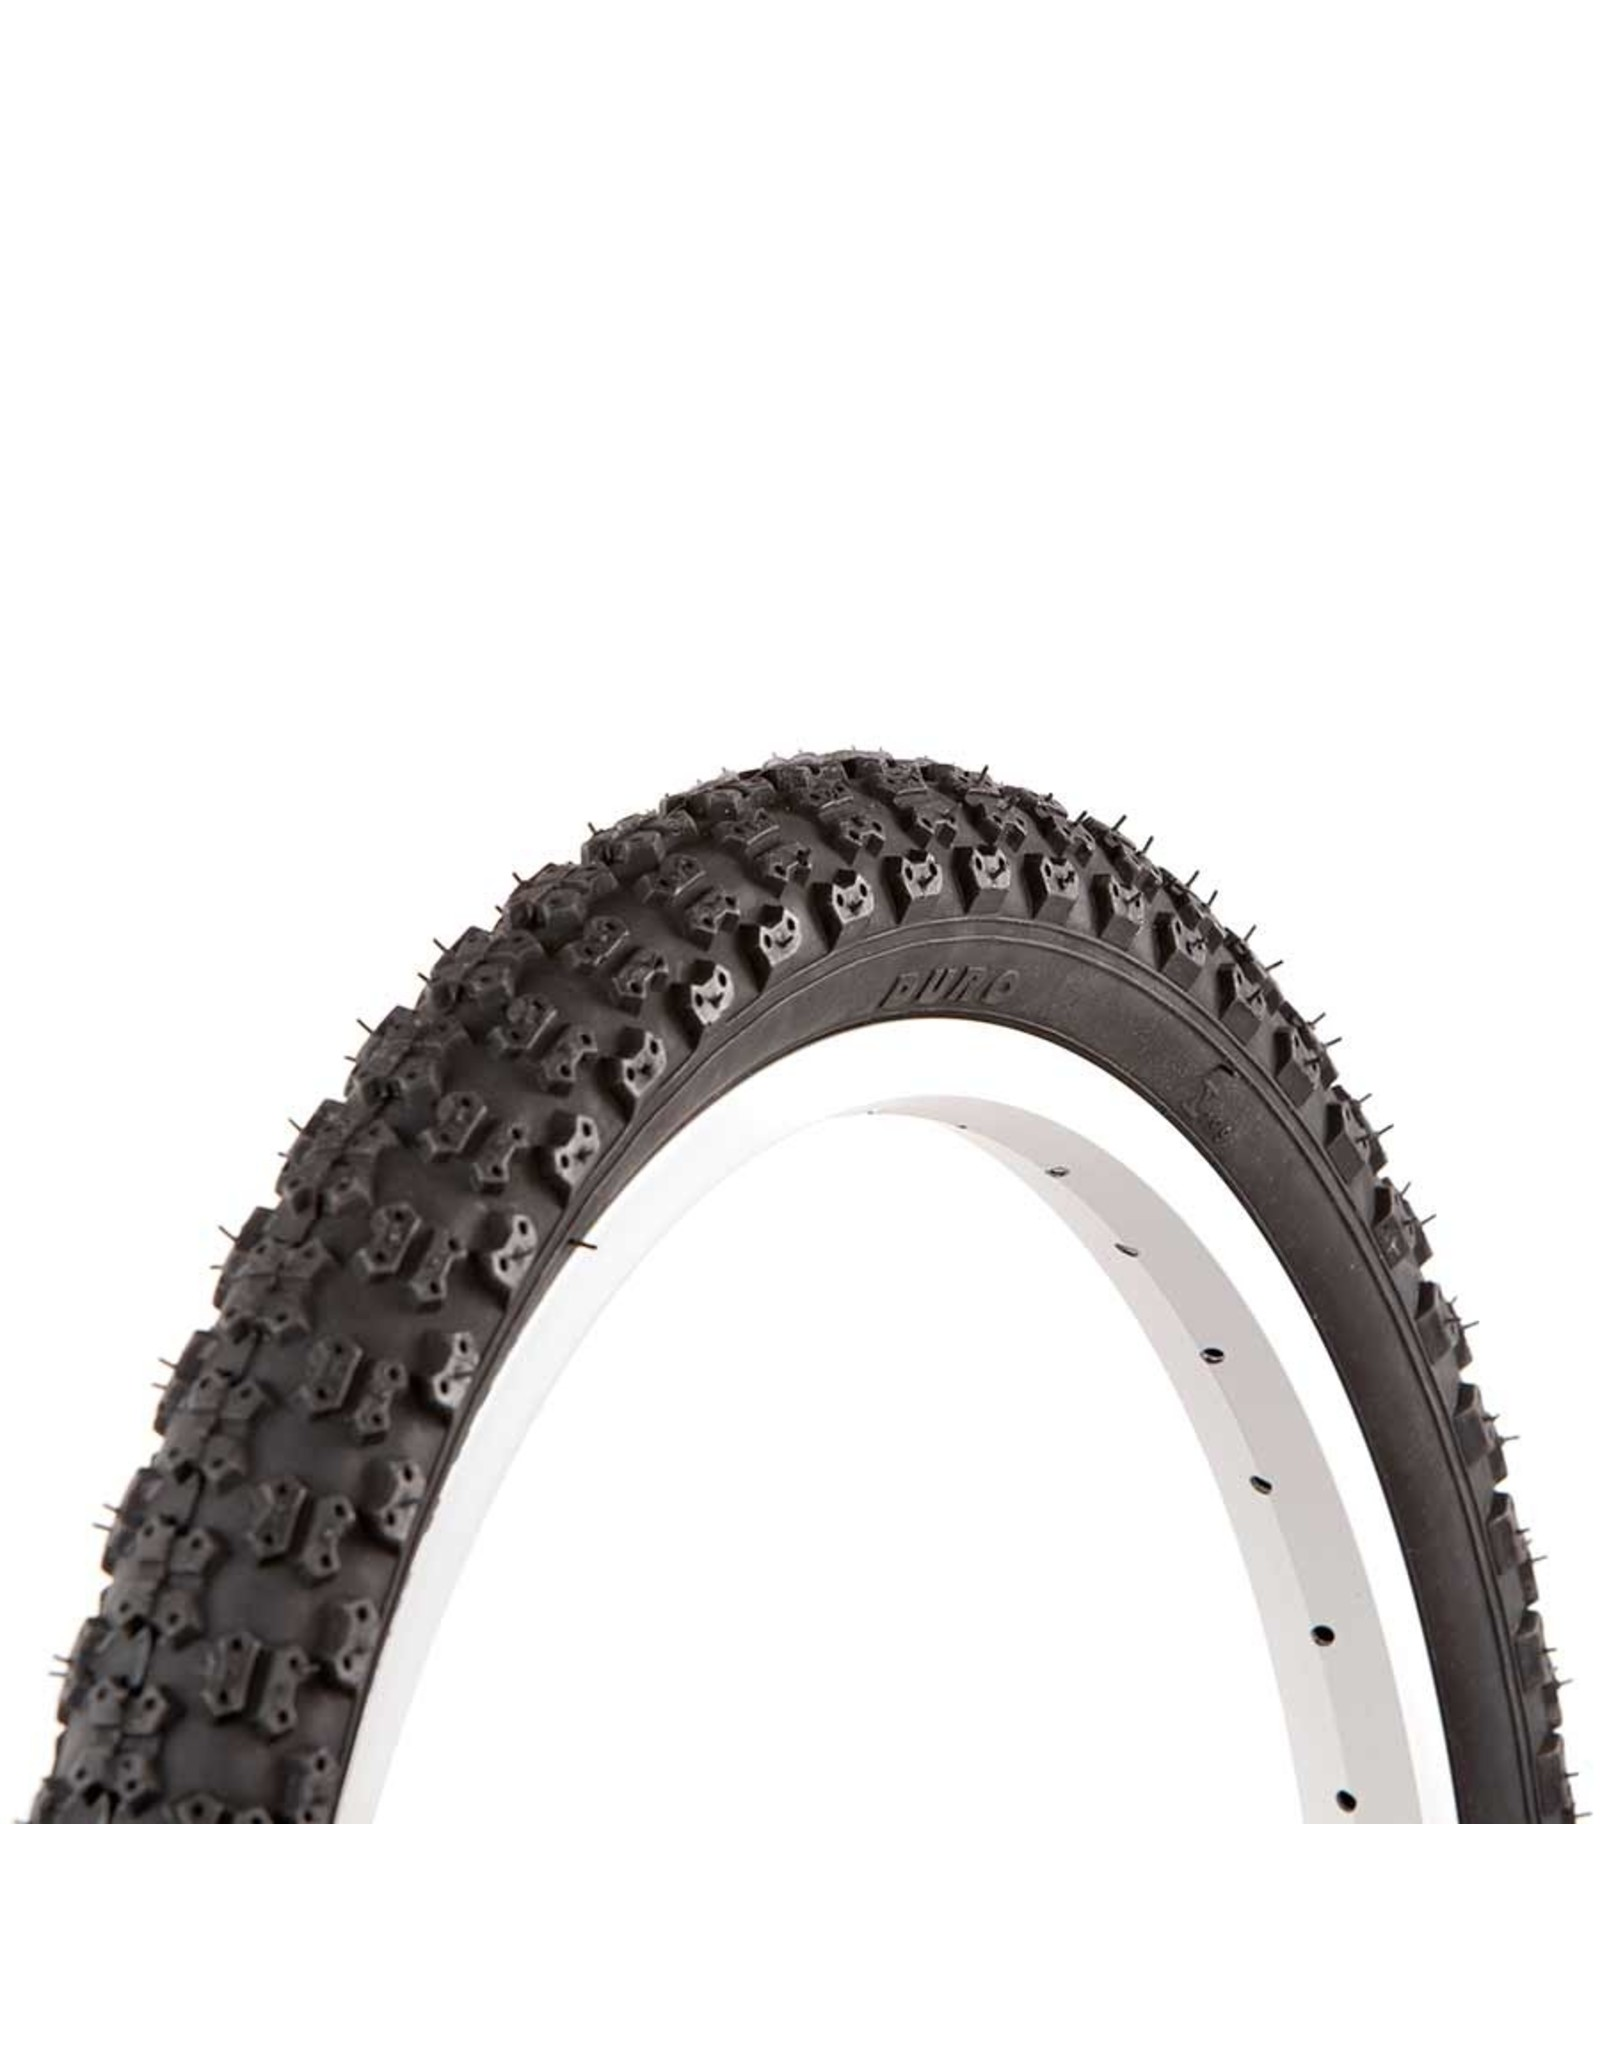 EVO EVO, Splash, Tire, 18''x1.75, Wire, Clincher, Black